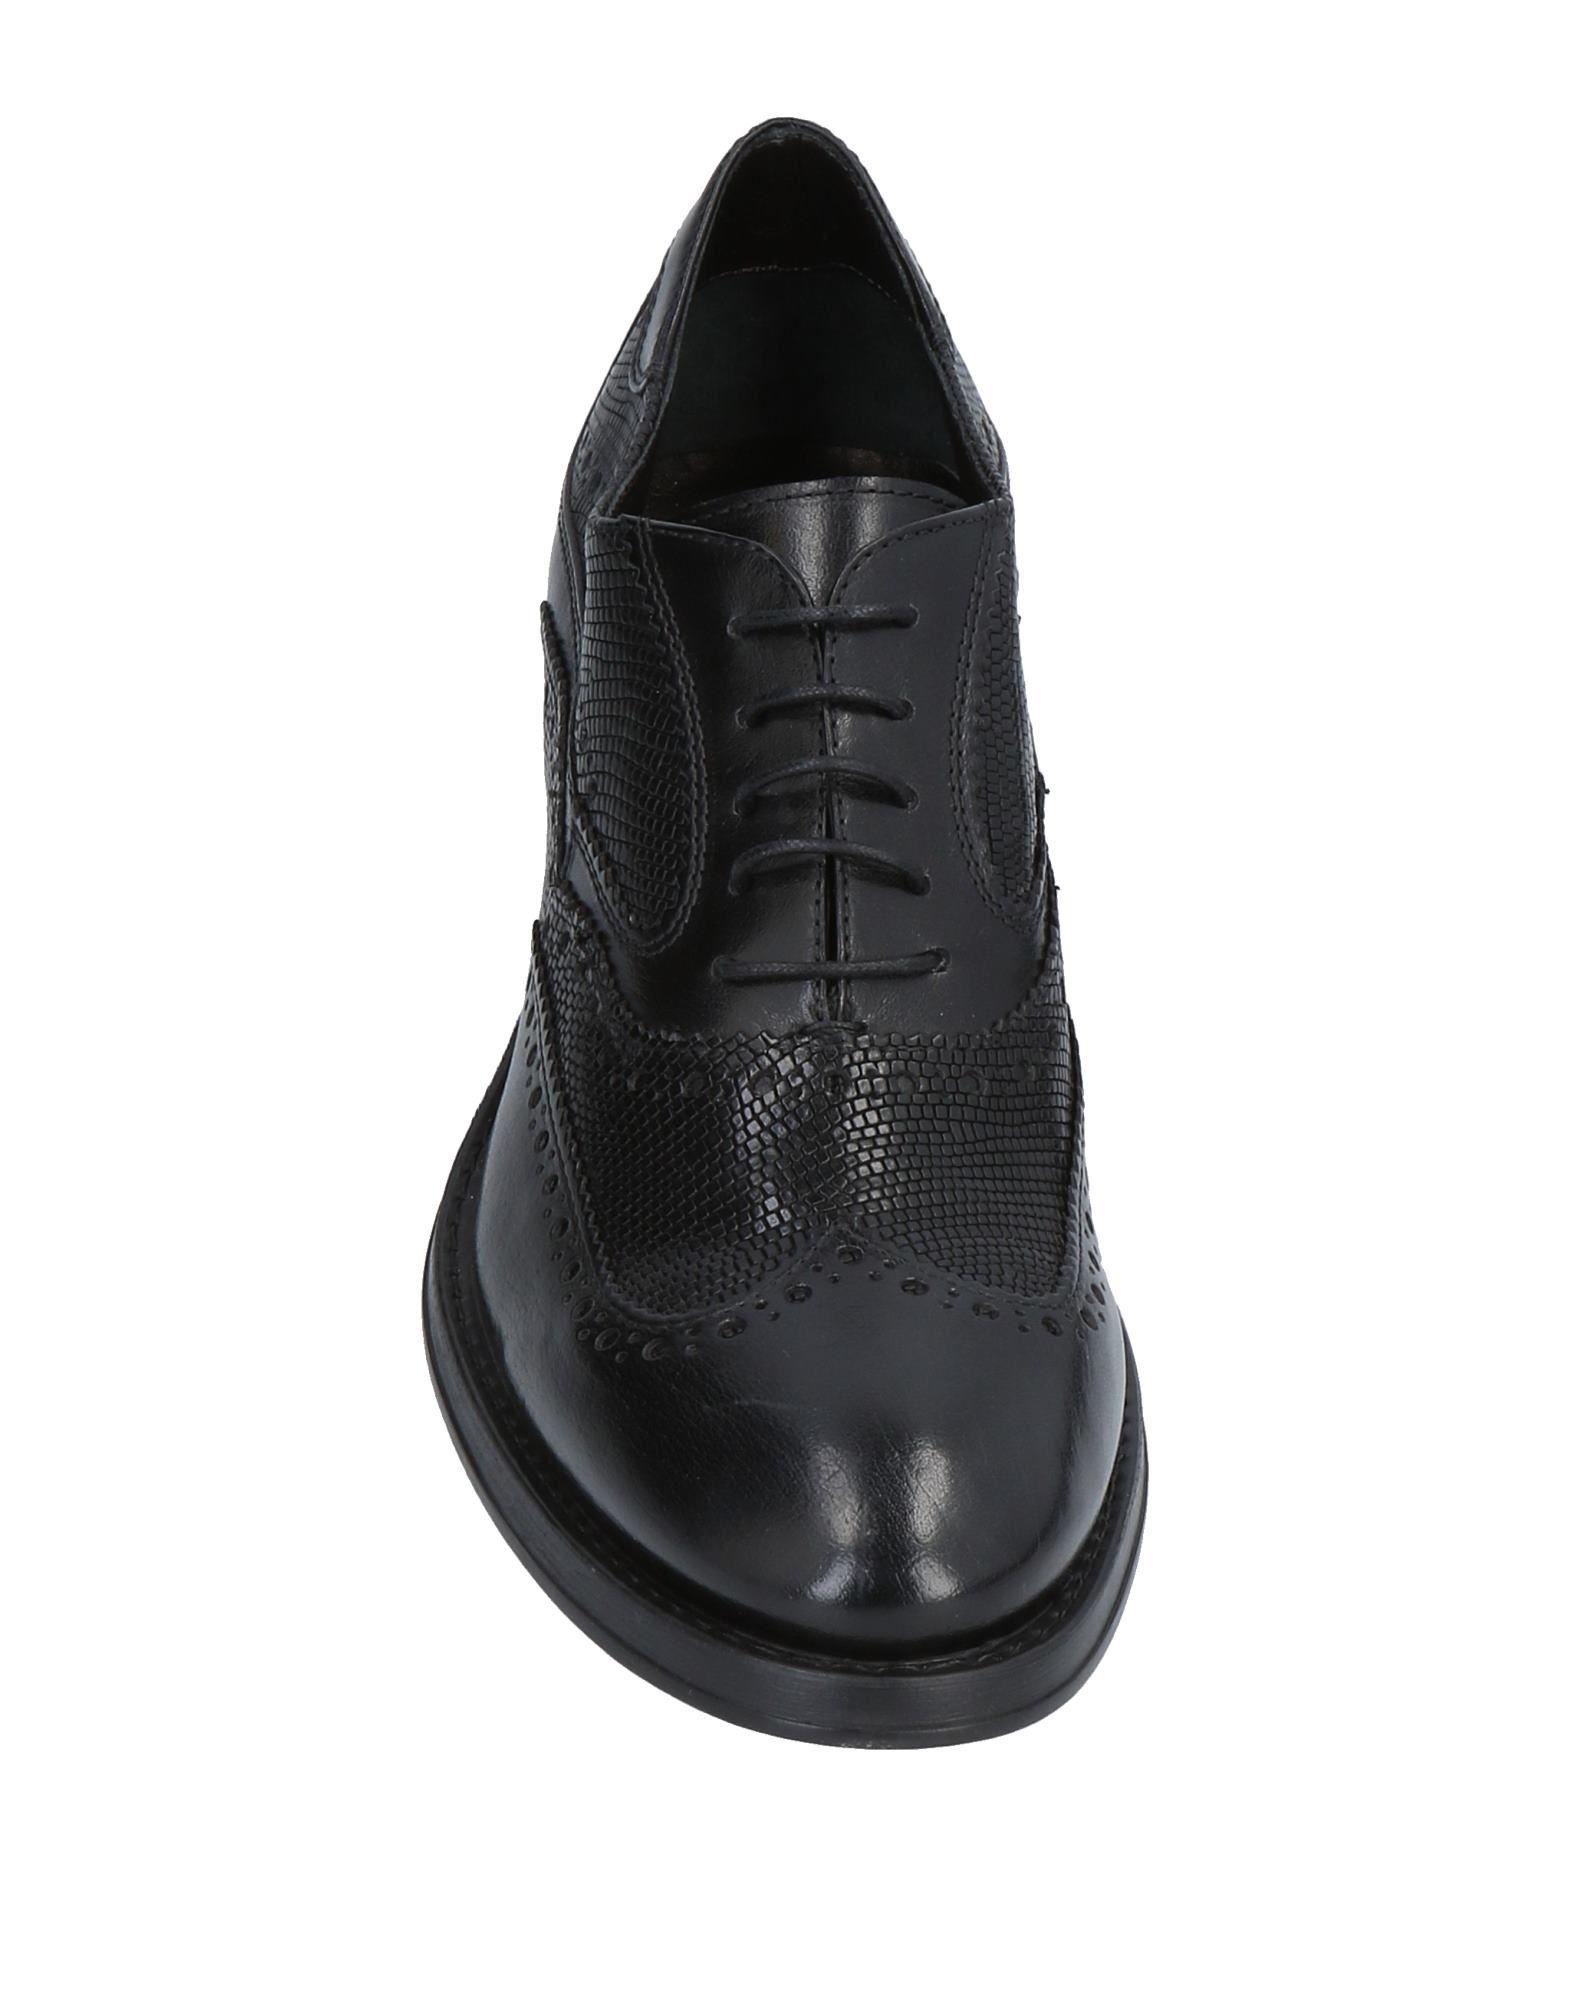 Corvari Qualität Schnürschuhe Damen  11485785XB Gute Qualität Corvari beliebte Schuhe 58a0b1